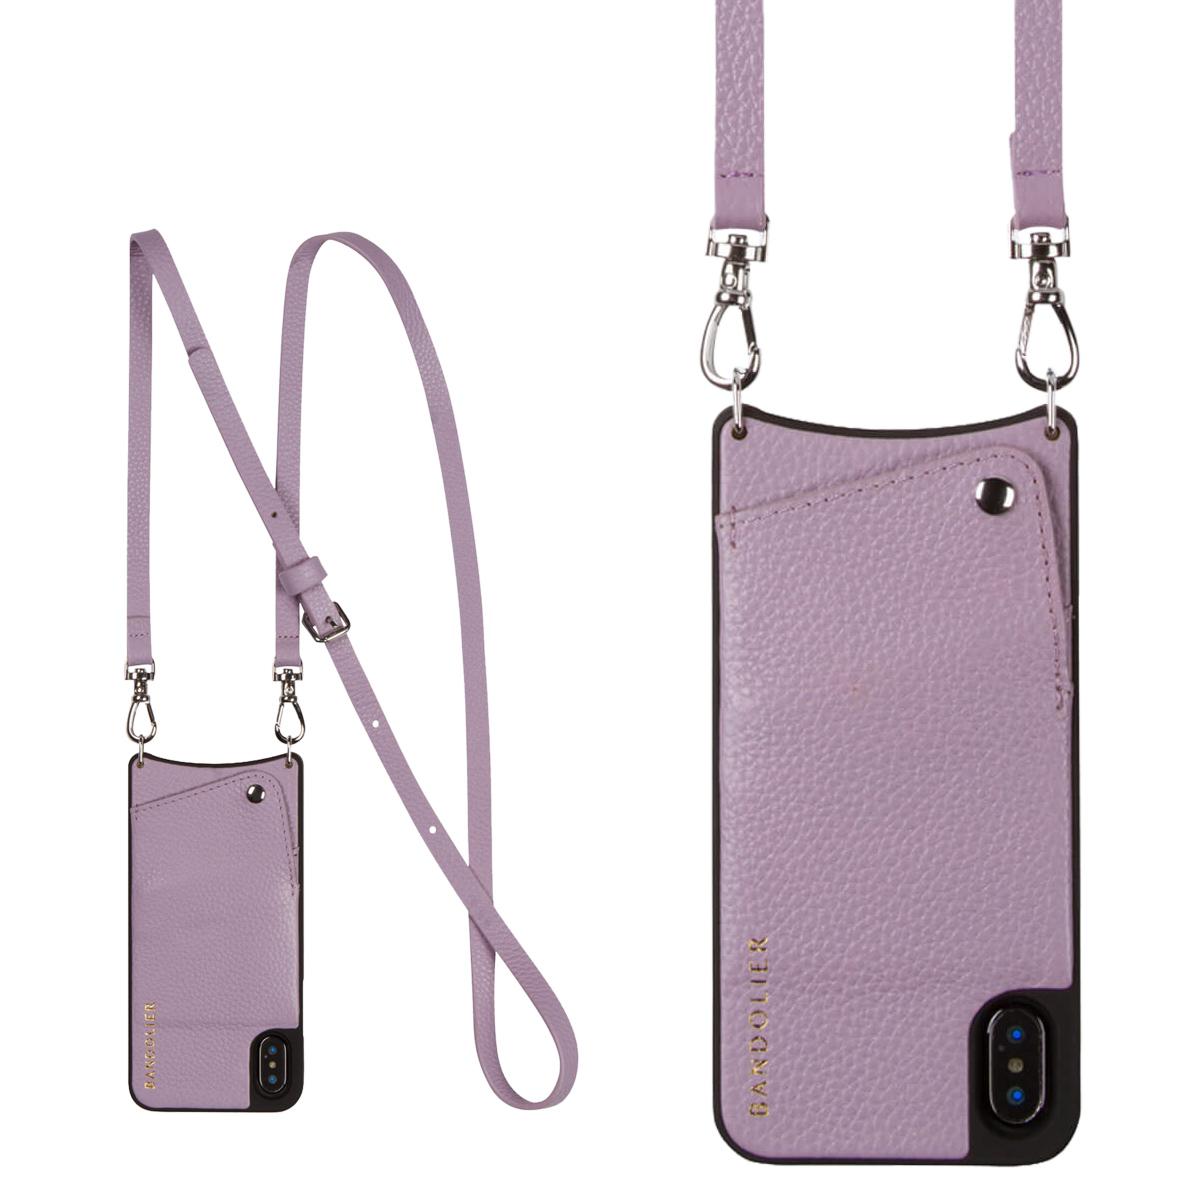 BANDOLIER iPhone XS MAX EMMA LILAC バンドリヤー ケース ショルダー スマホ アイフォン レザー メンズ レディース ライラック 10EMM1001 [予約商品 4月下旬頃入荷予定 再入荷][194]